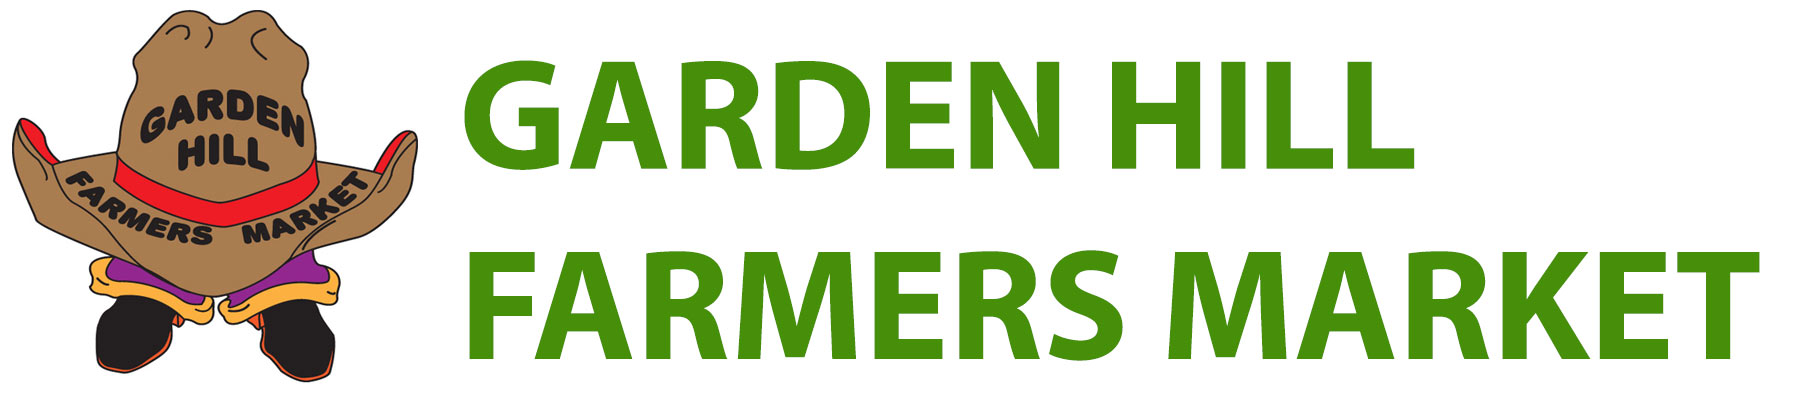 Garden Hill Farmers Market